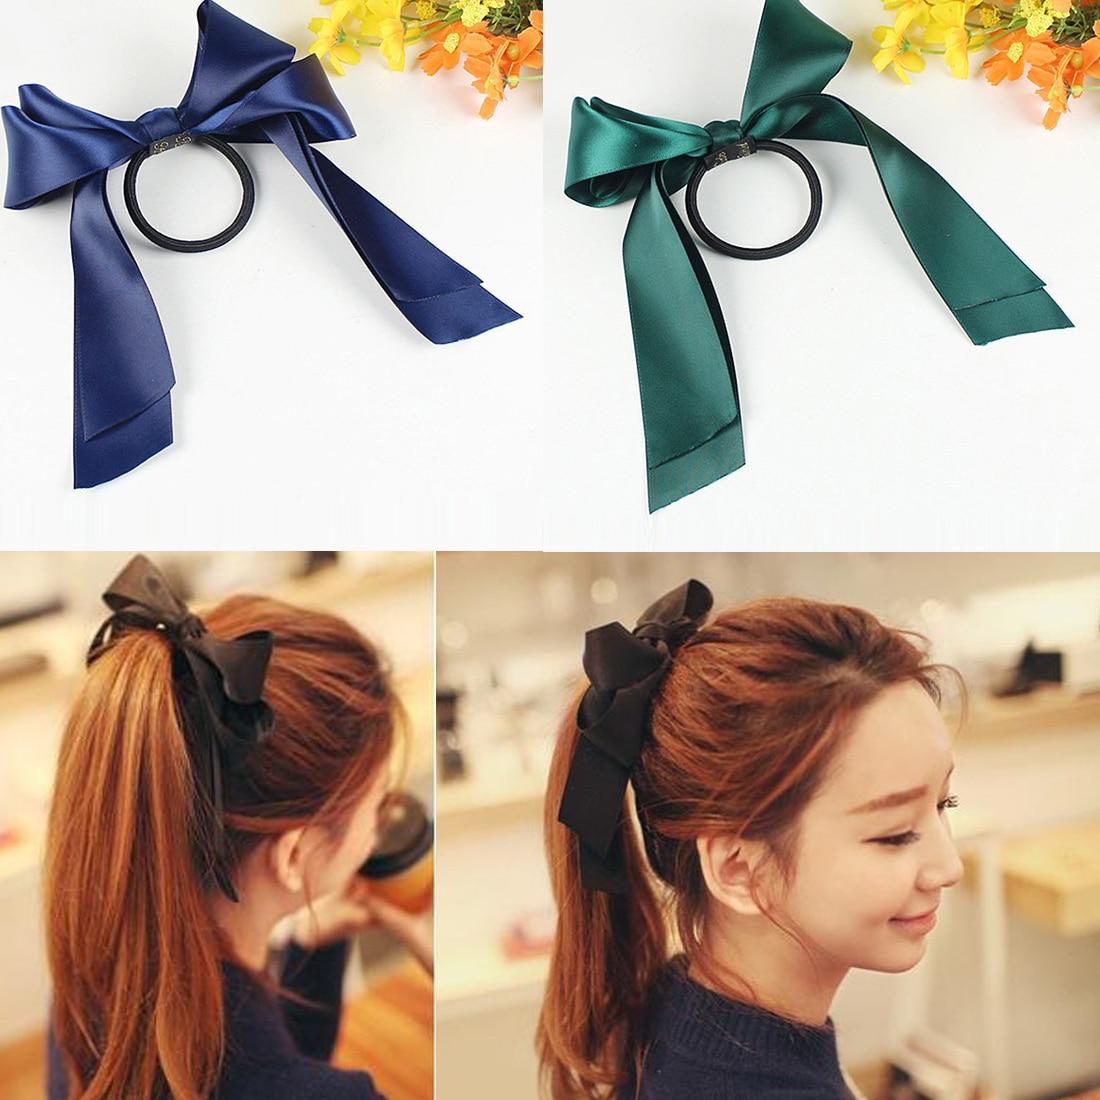 Daughter Mum Baby  Bowknot Hair Band Matching Elastic Headband Floral Turban Knot Accessories Headwear